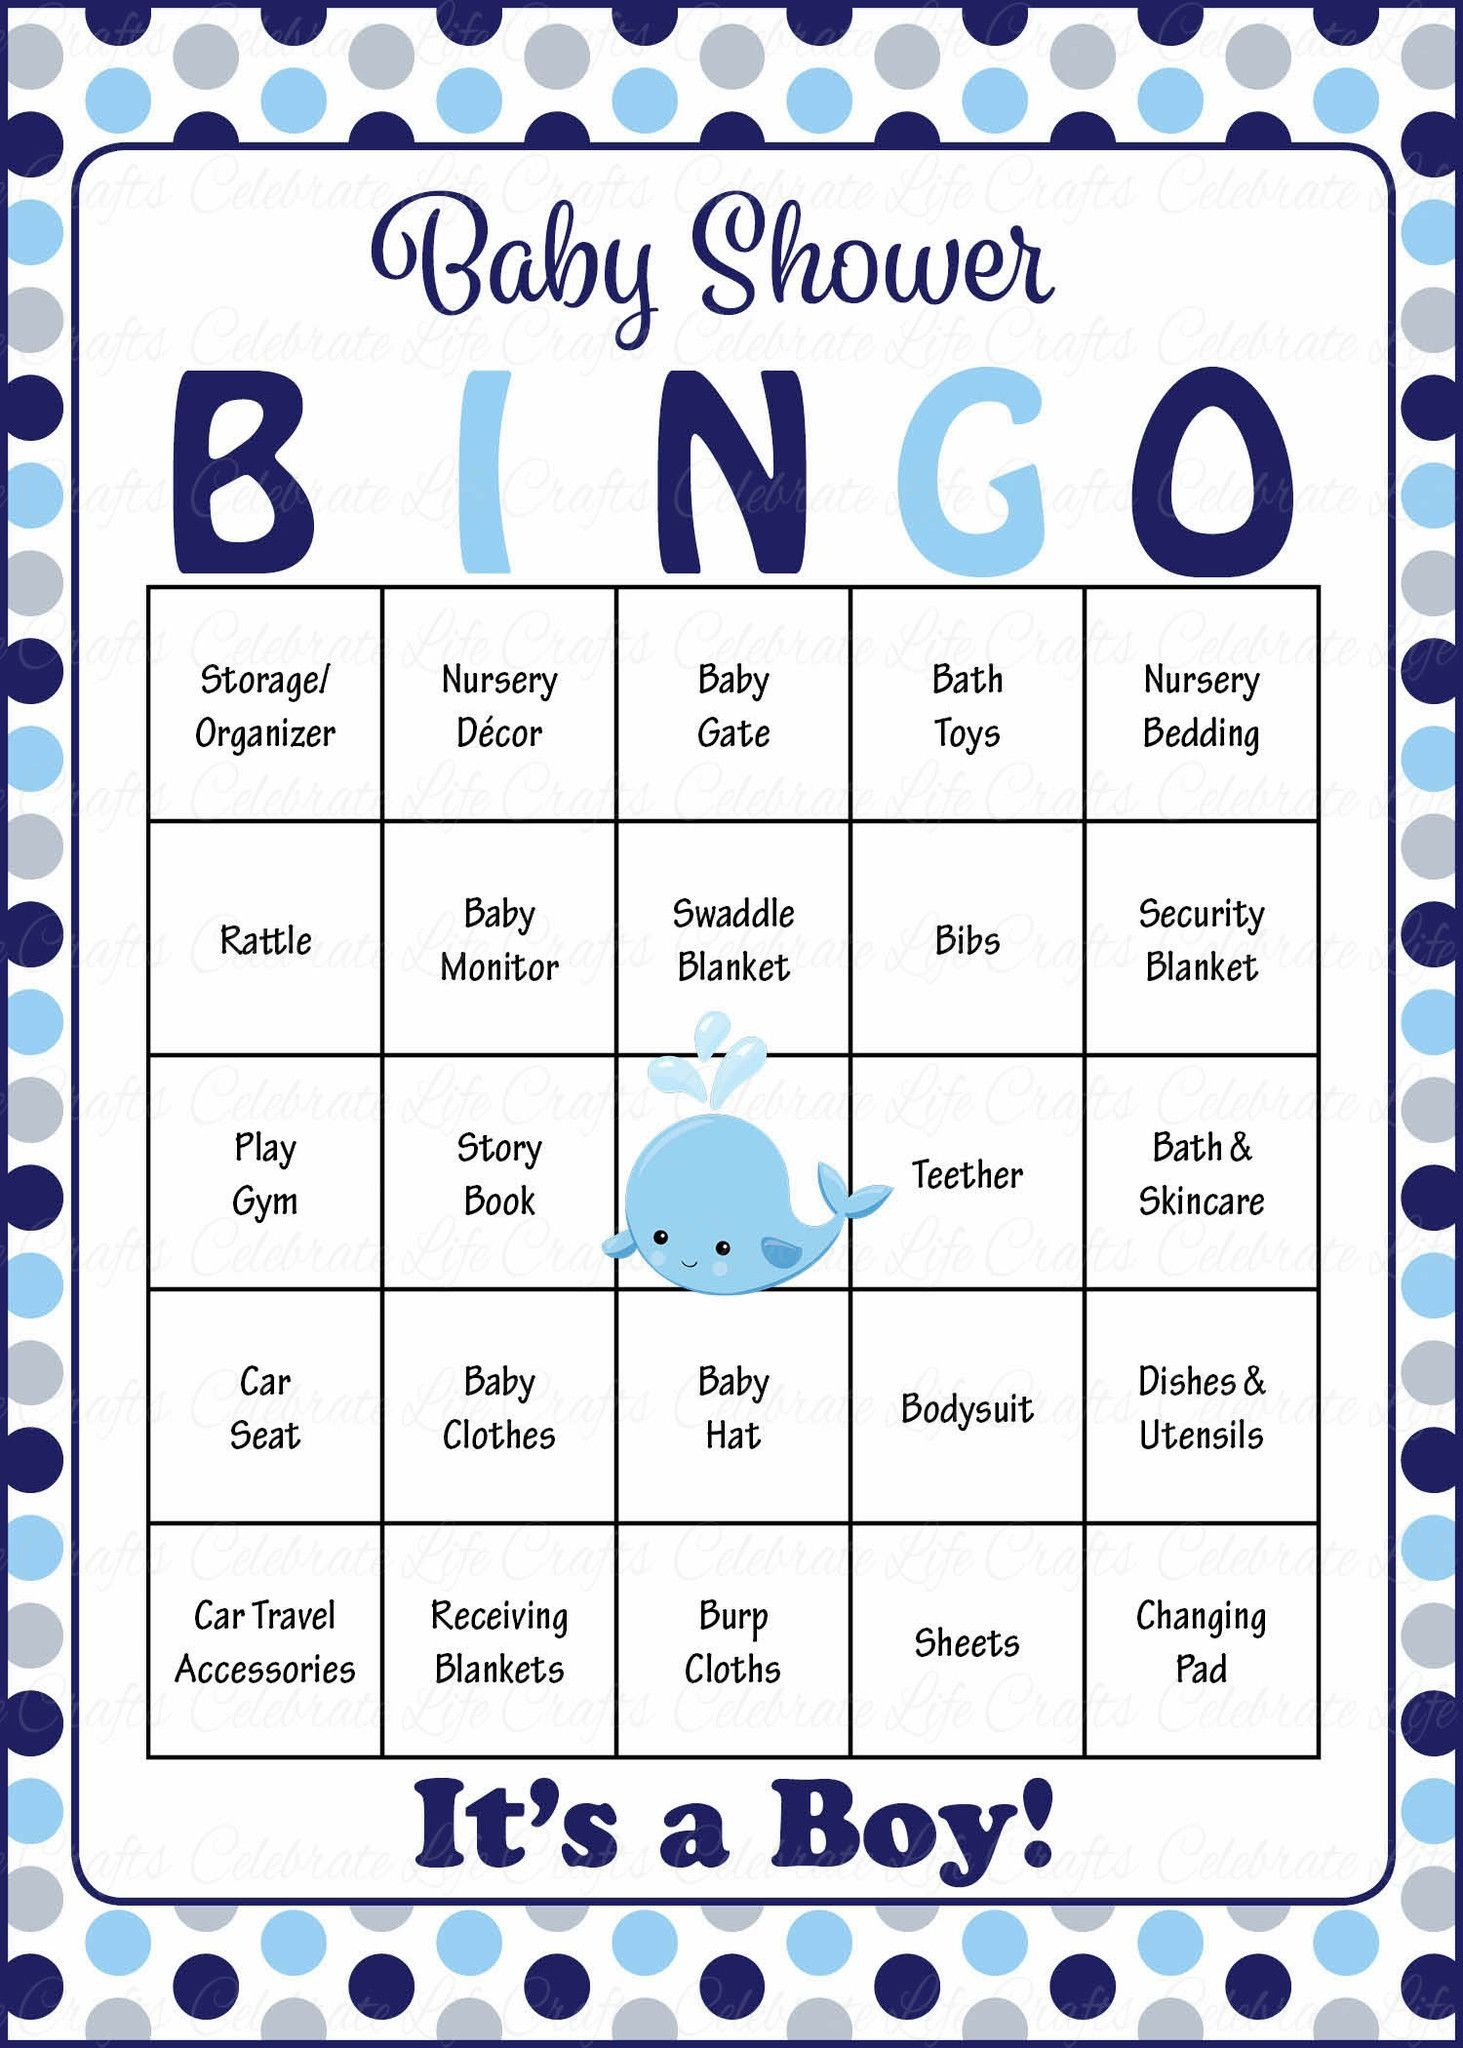 Whale Baby Bingo Cards - Printable Download - Prefilled - Baby - Free Printable Baby Shower Bingo